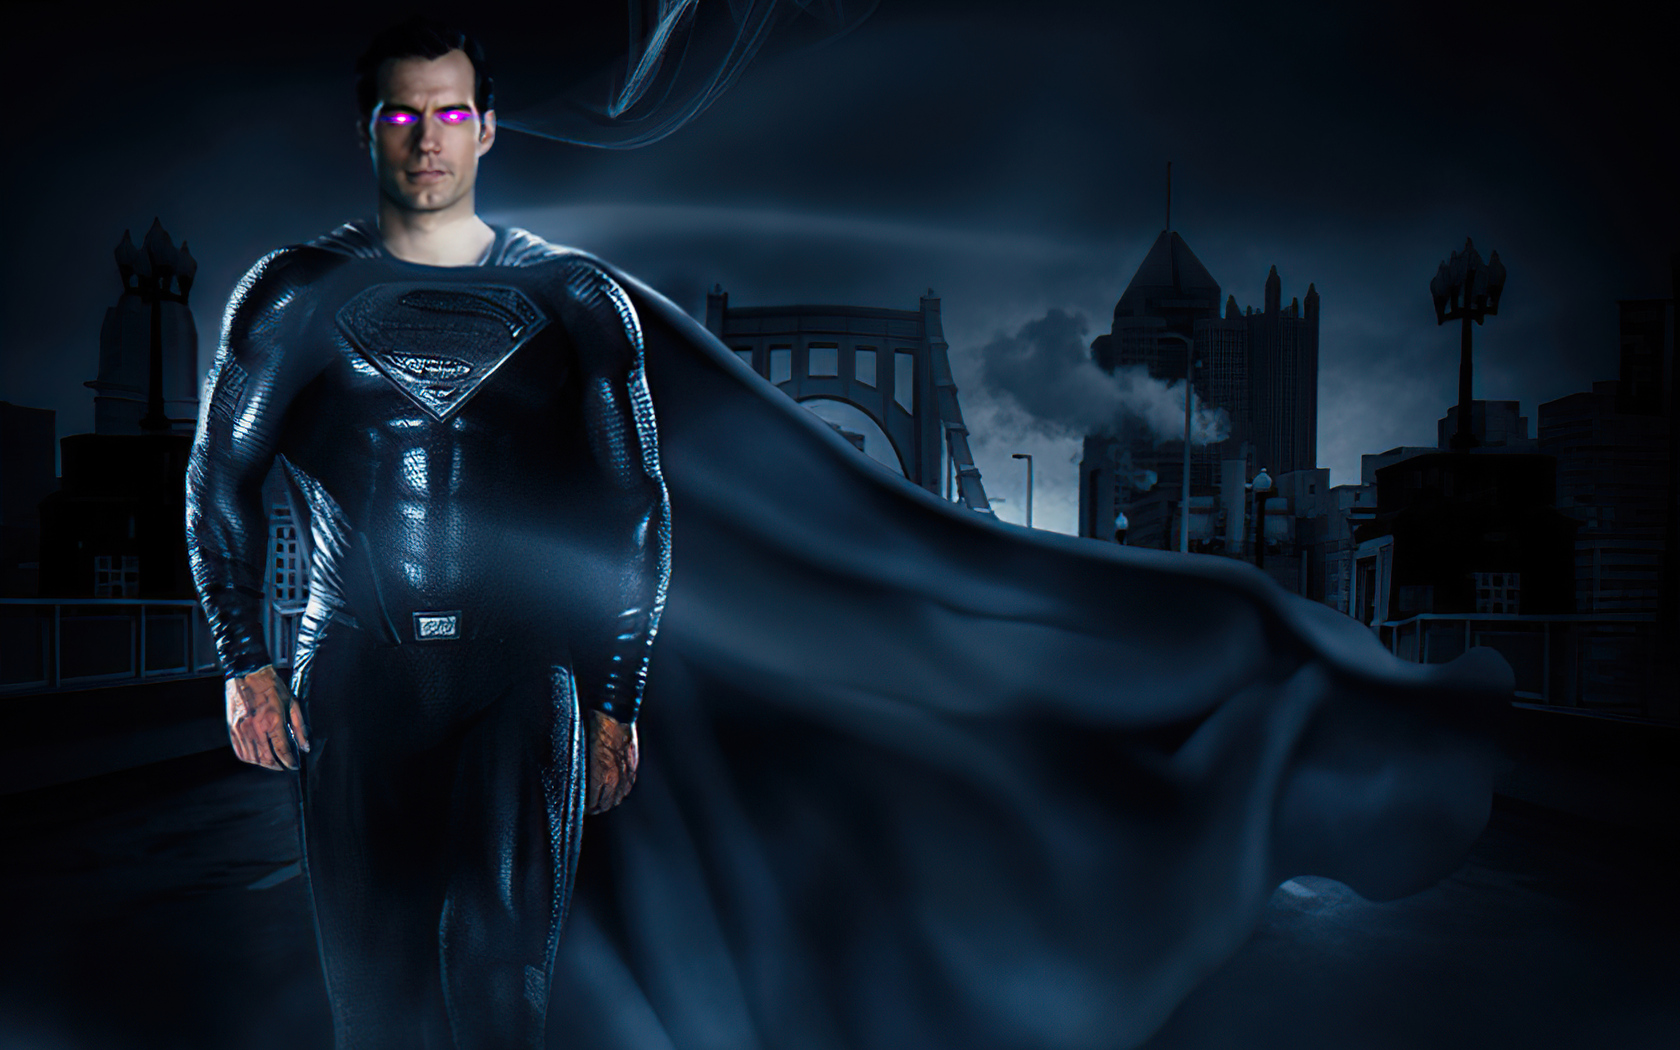 the-superman-black-suit-4k-nx.jpg